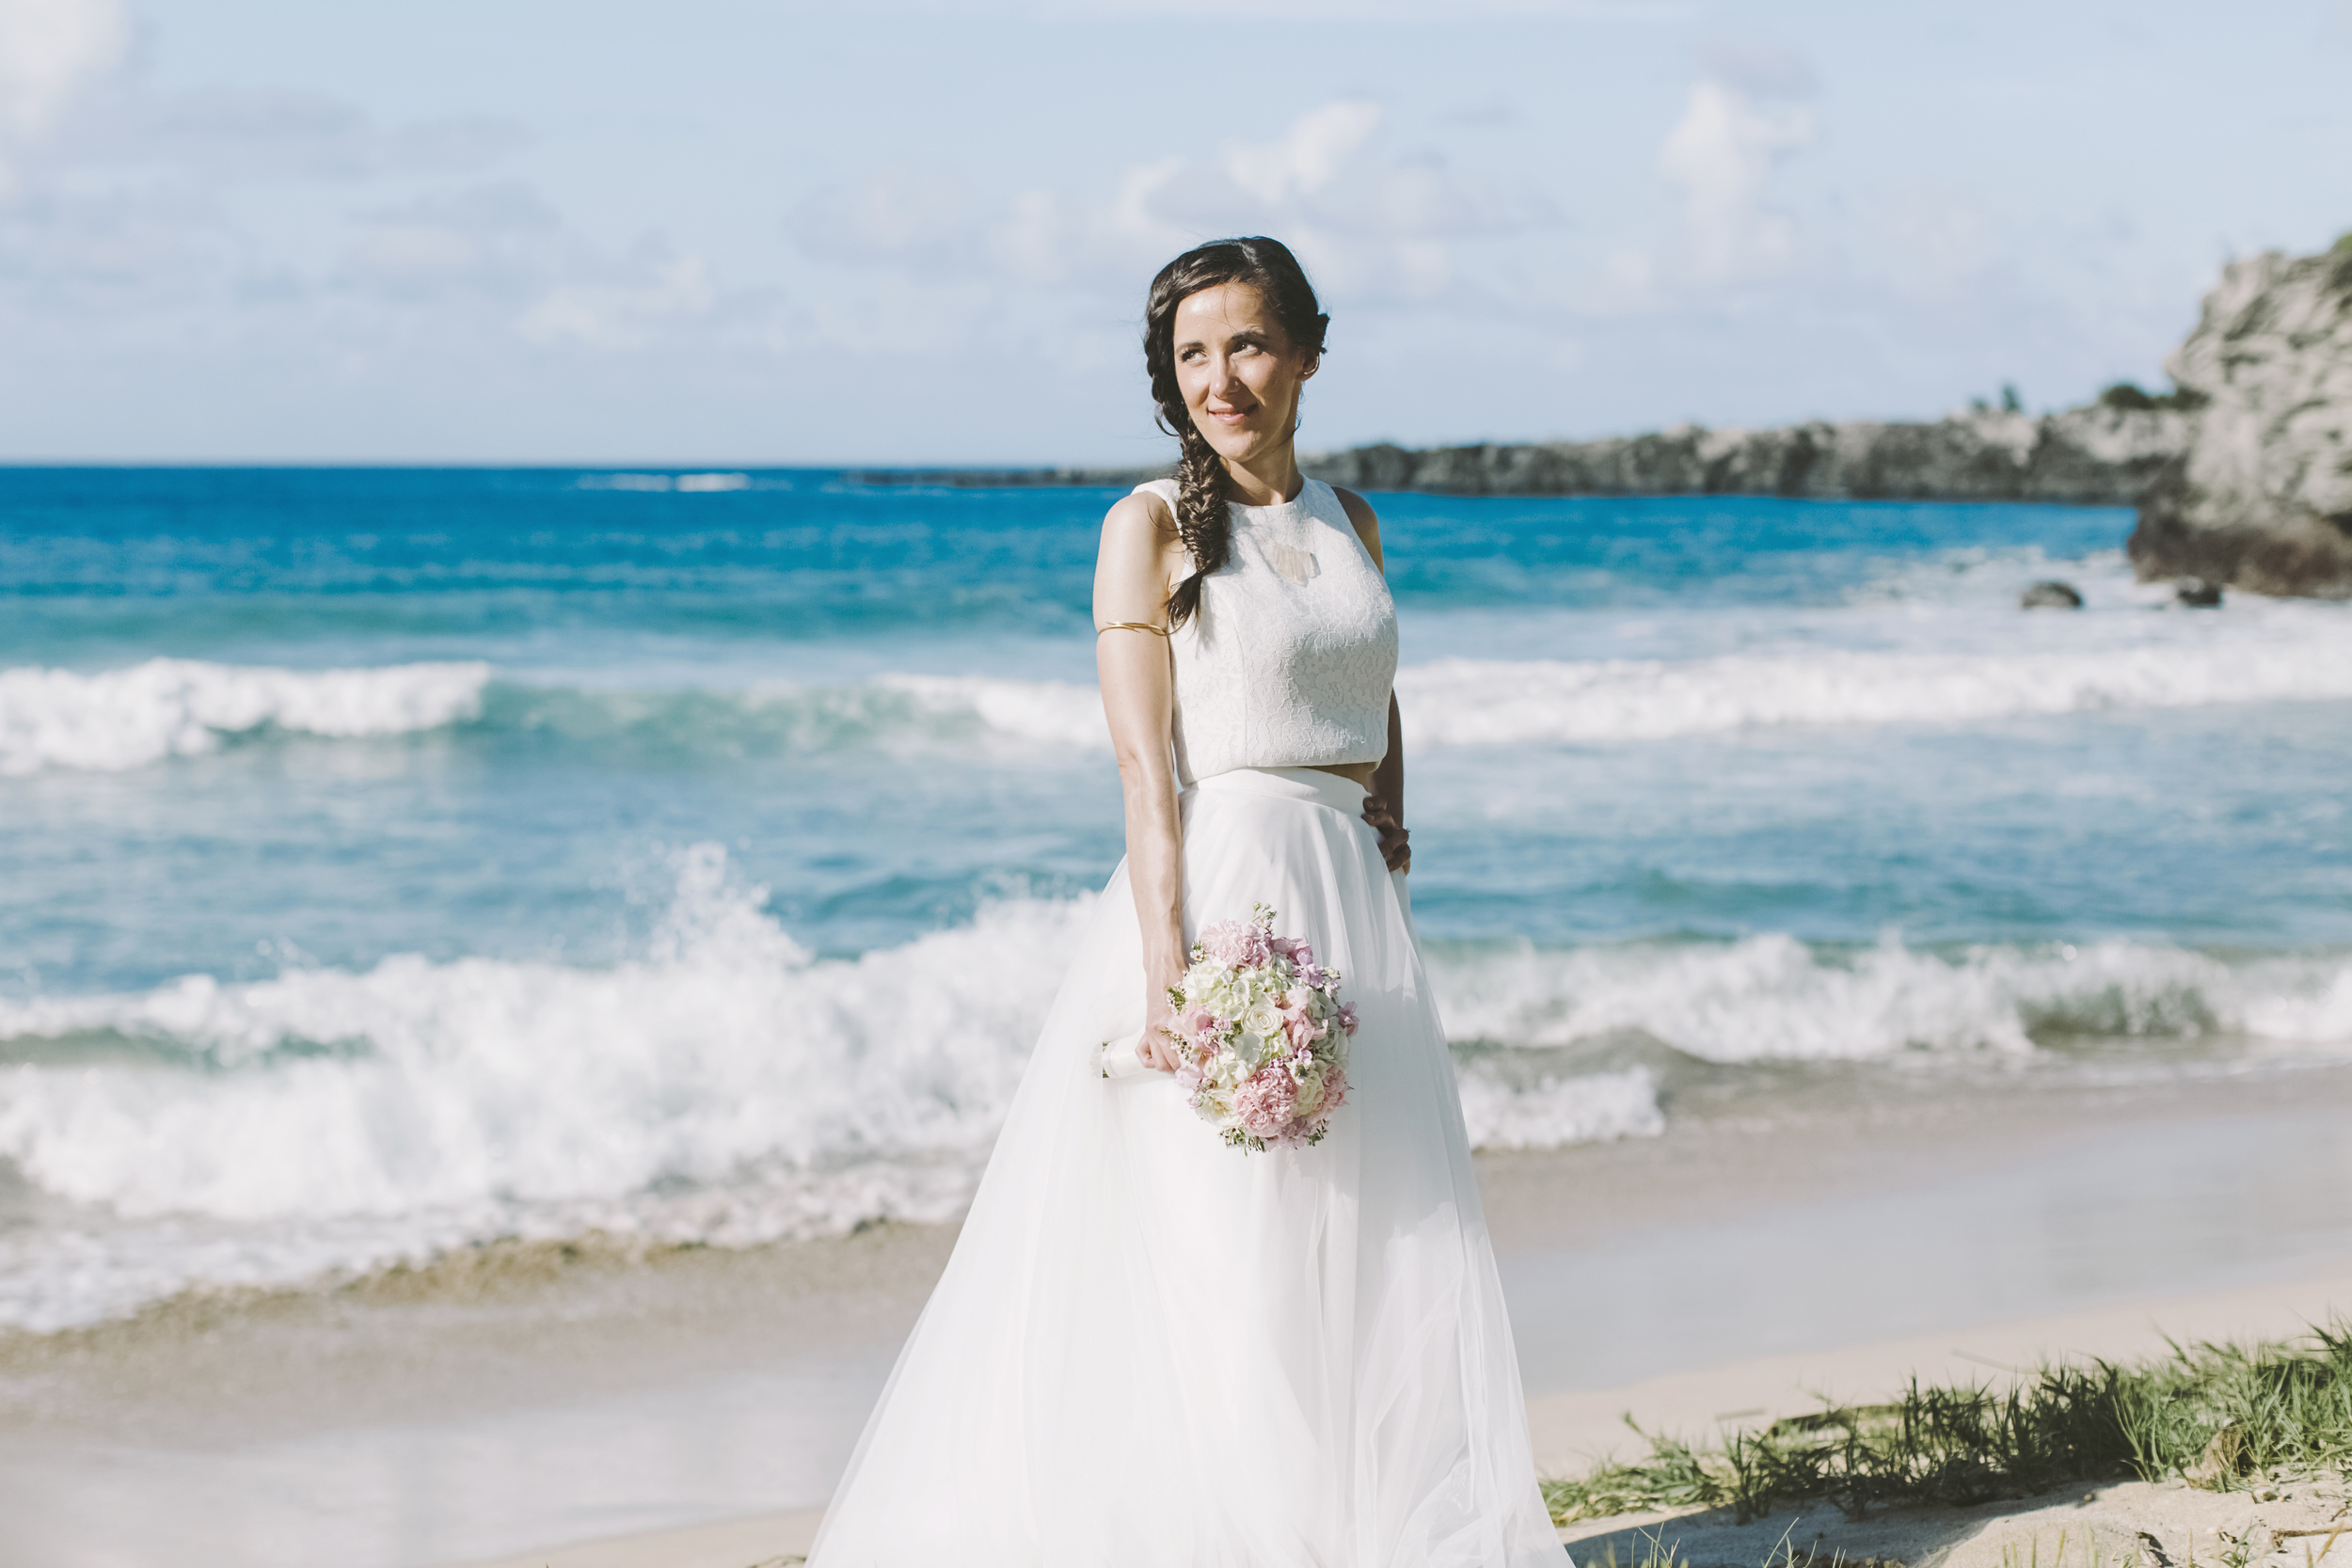 angie-diaz-photography-maui-wedding-ironwoods-beach-37.jpg